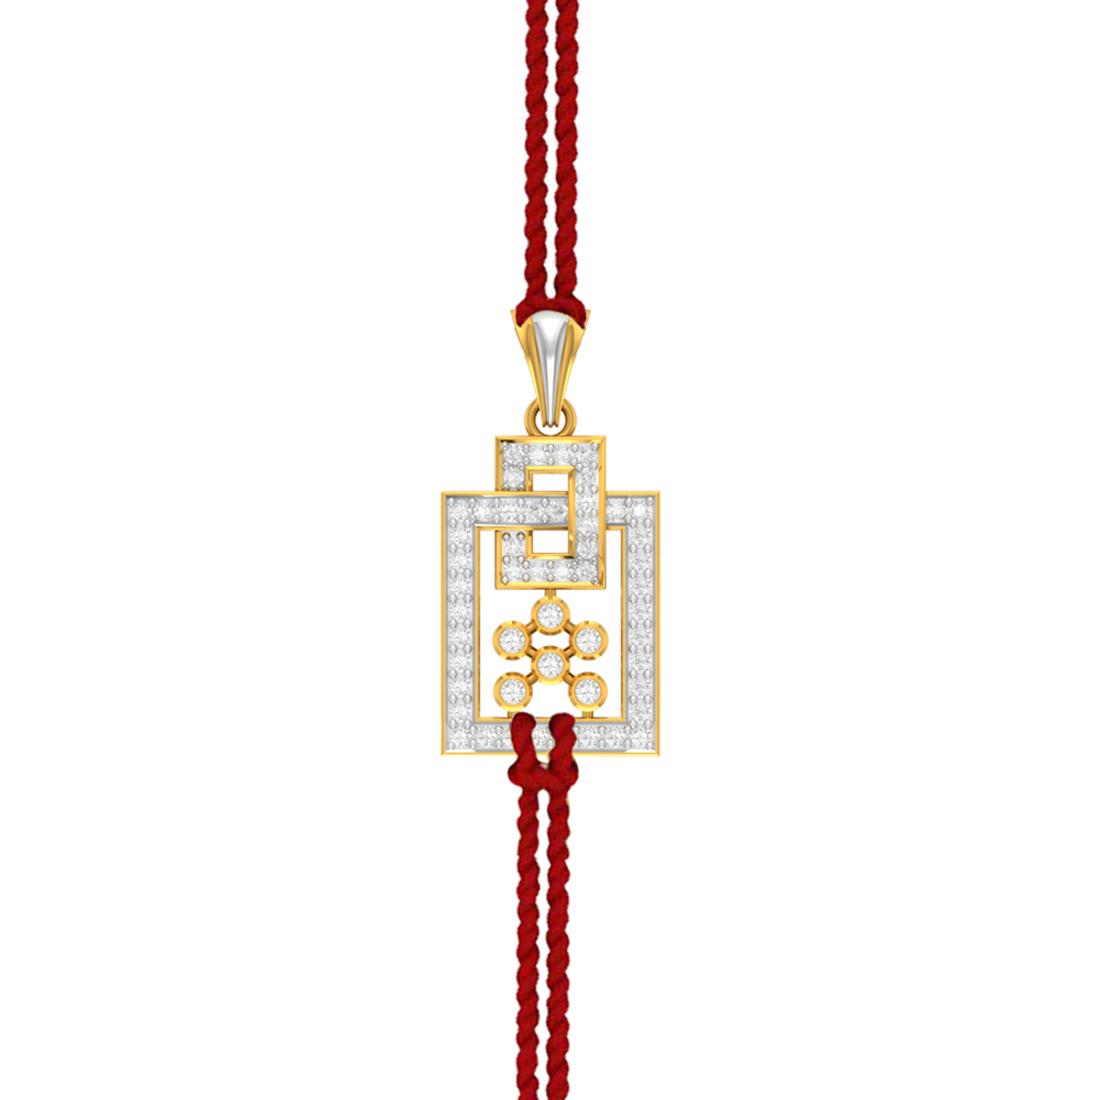 Charu Jewels Amaze Diamond Pendant for Rakhi